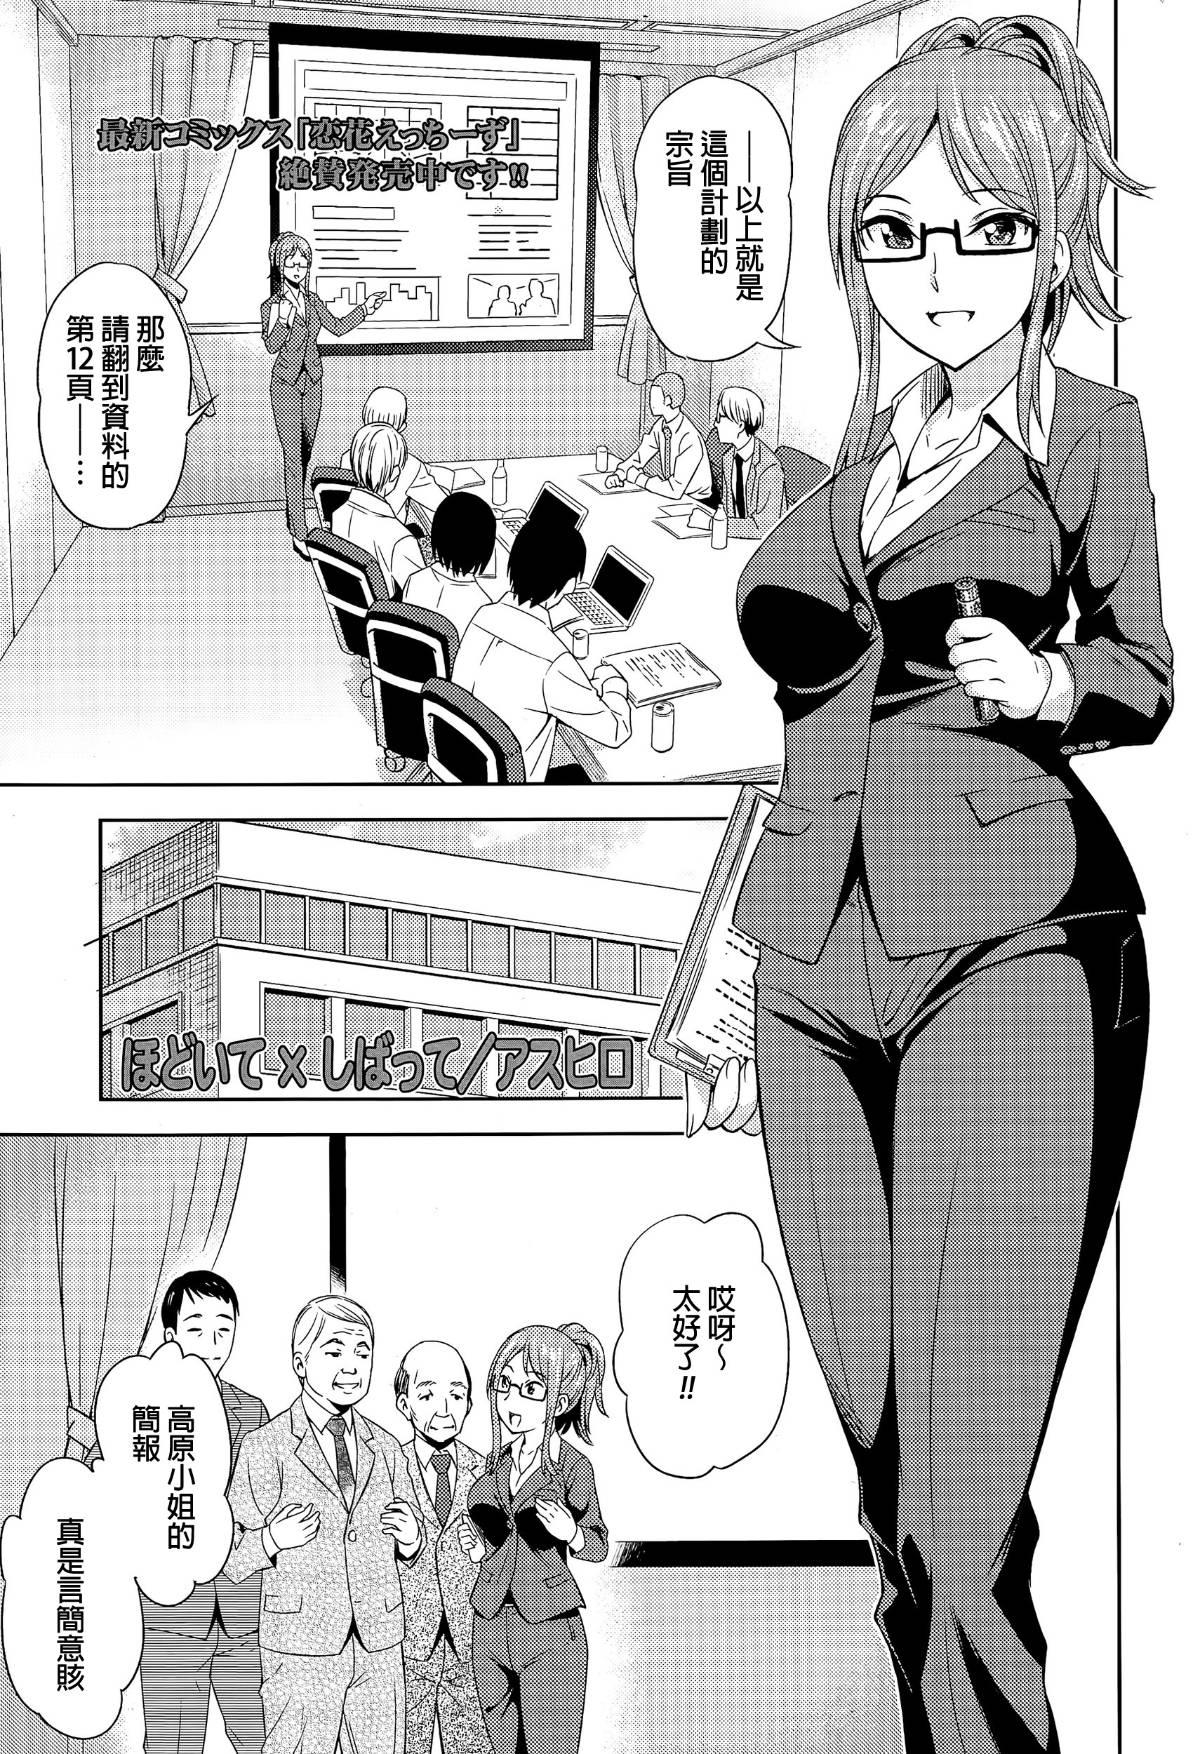 [beamsinbox漢化] [アスヒロ] ほどいて×しばって (コミックメガストアα 2015年7月號)(23P) - 情色卡漫 -